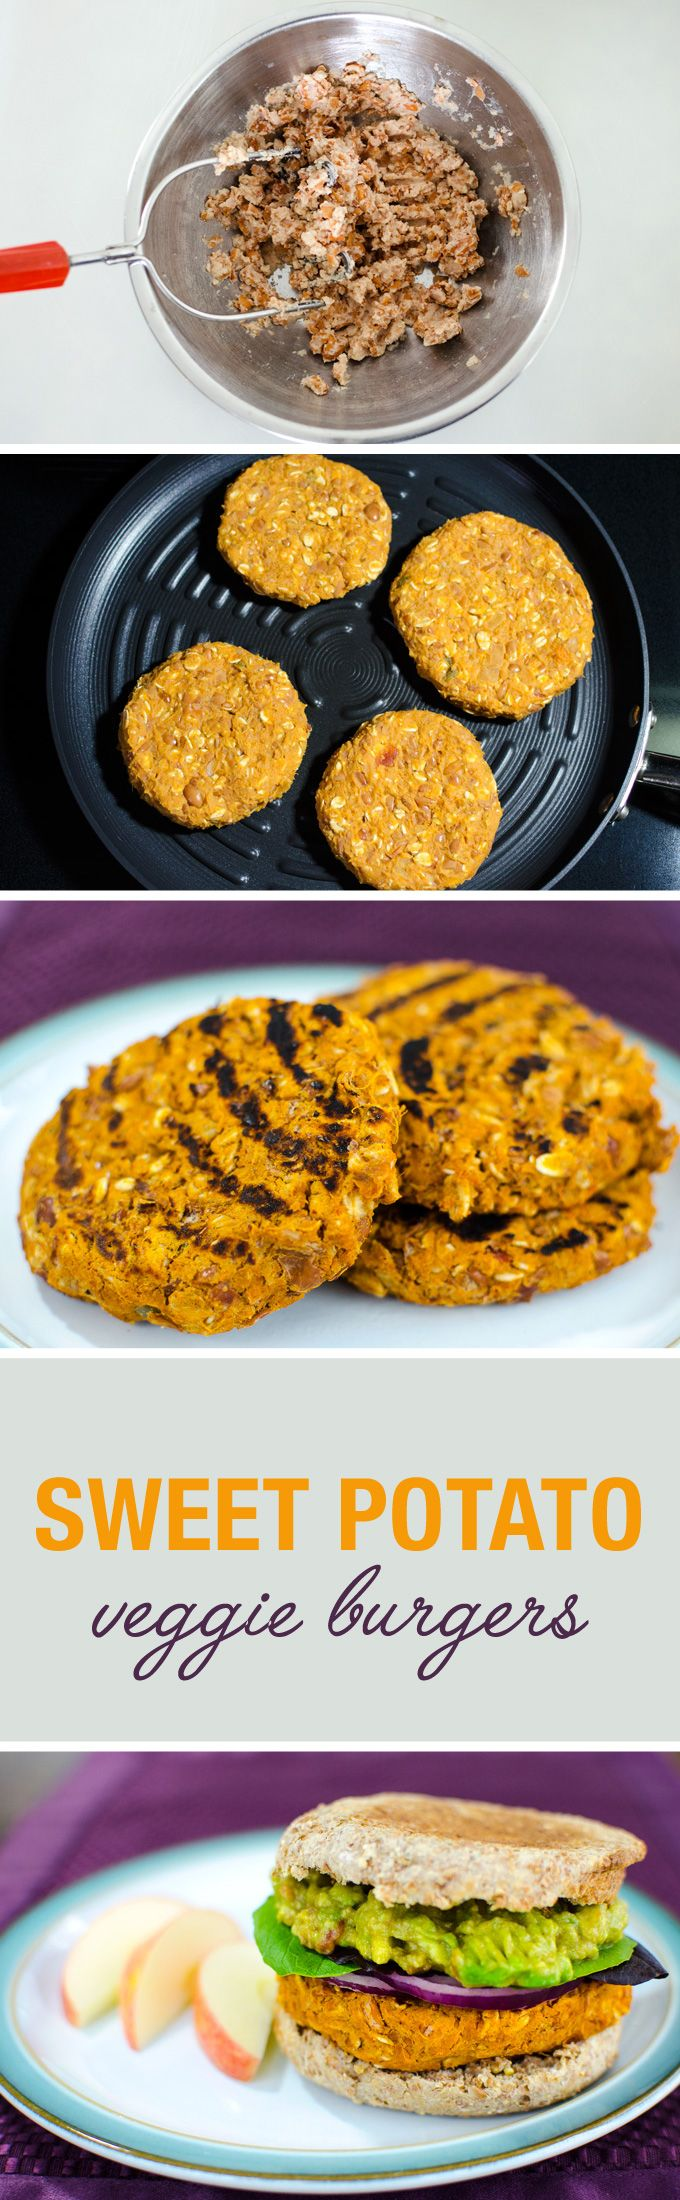 Sweet Potato Veggie Burgers with quick guacamole - a simple vegan and gluten free recipe - YUM! | VeggiePrimer.com